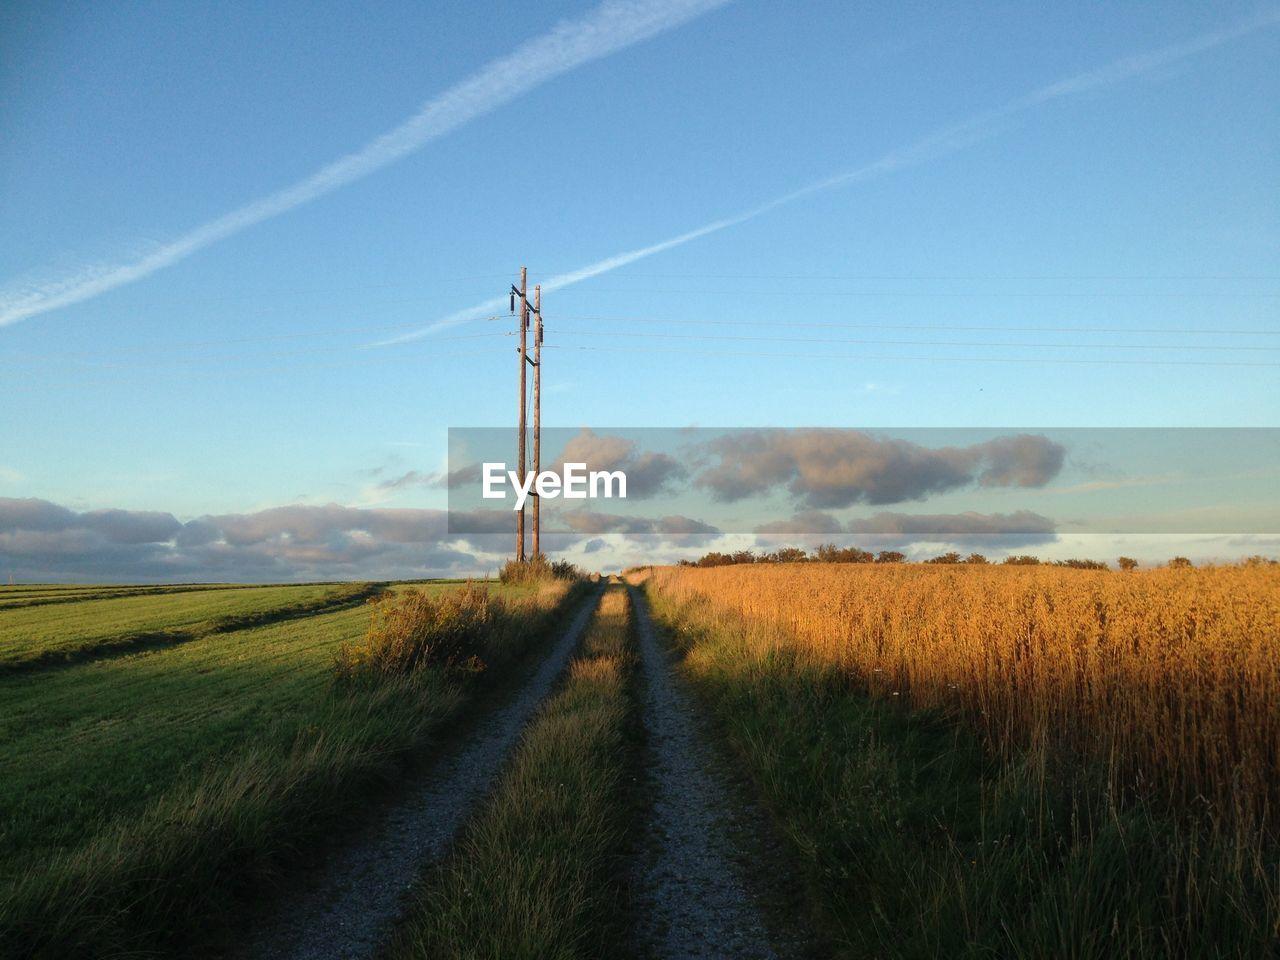 Footpath Amidst Grassy Field Against Sky